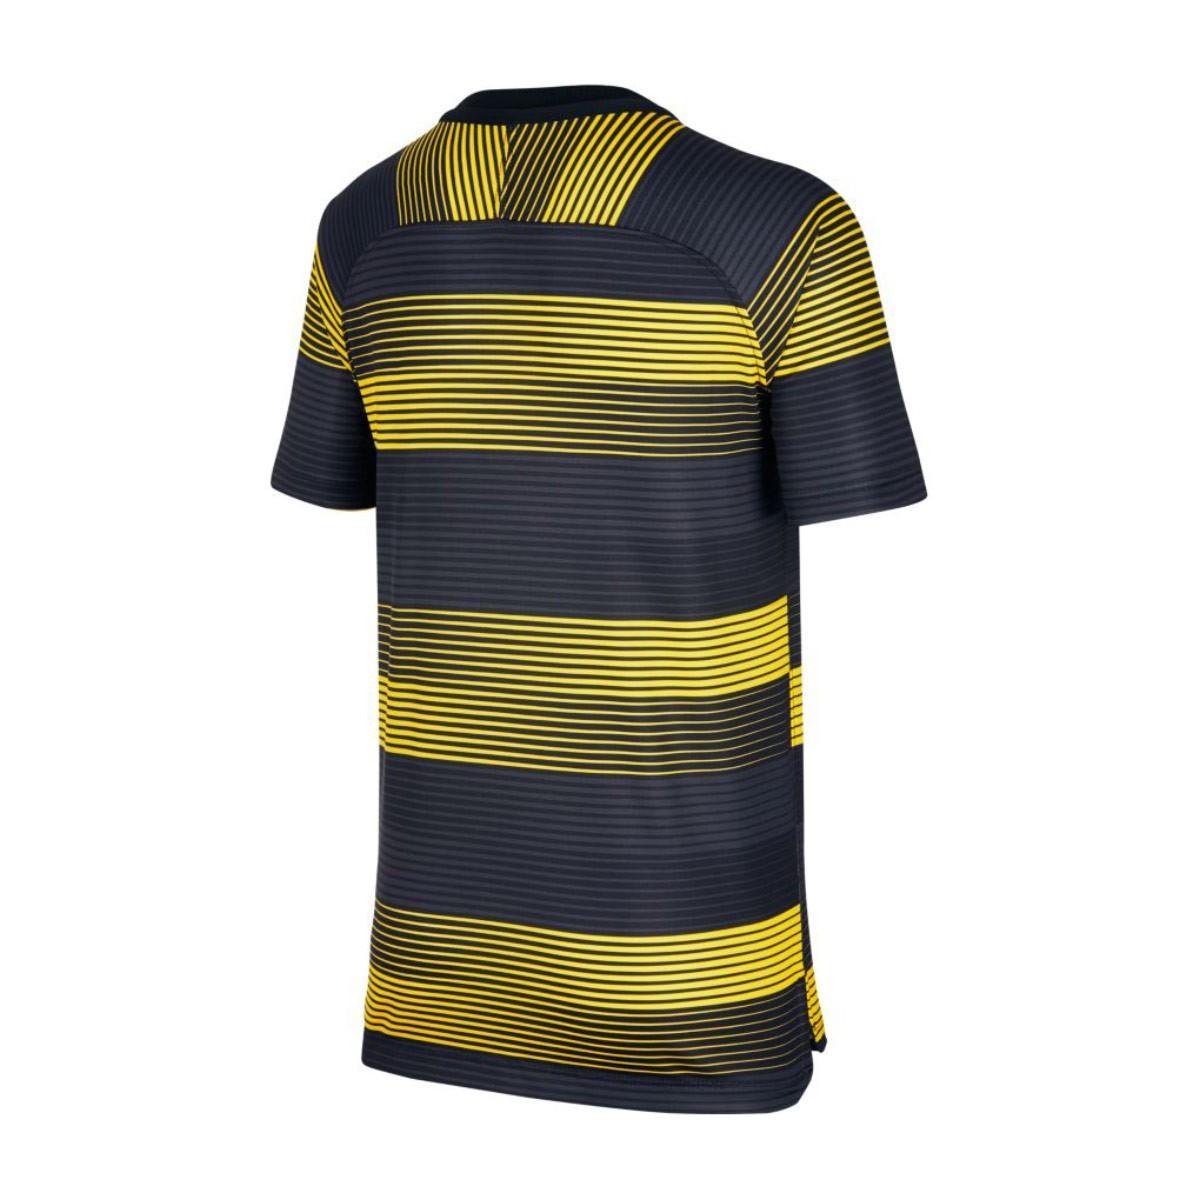 timeless design 7340a e4fd3 Camiseta Manchester City FC Dry Squad SS GX 2 2018-2019 Niño Optical  yellow-Black